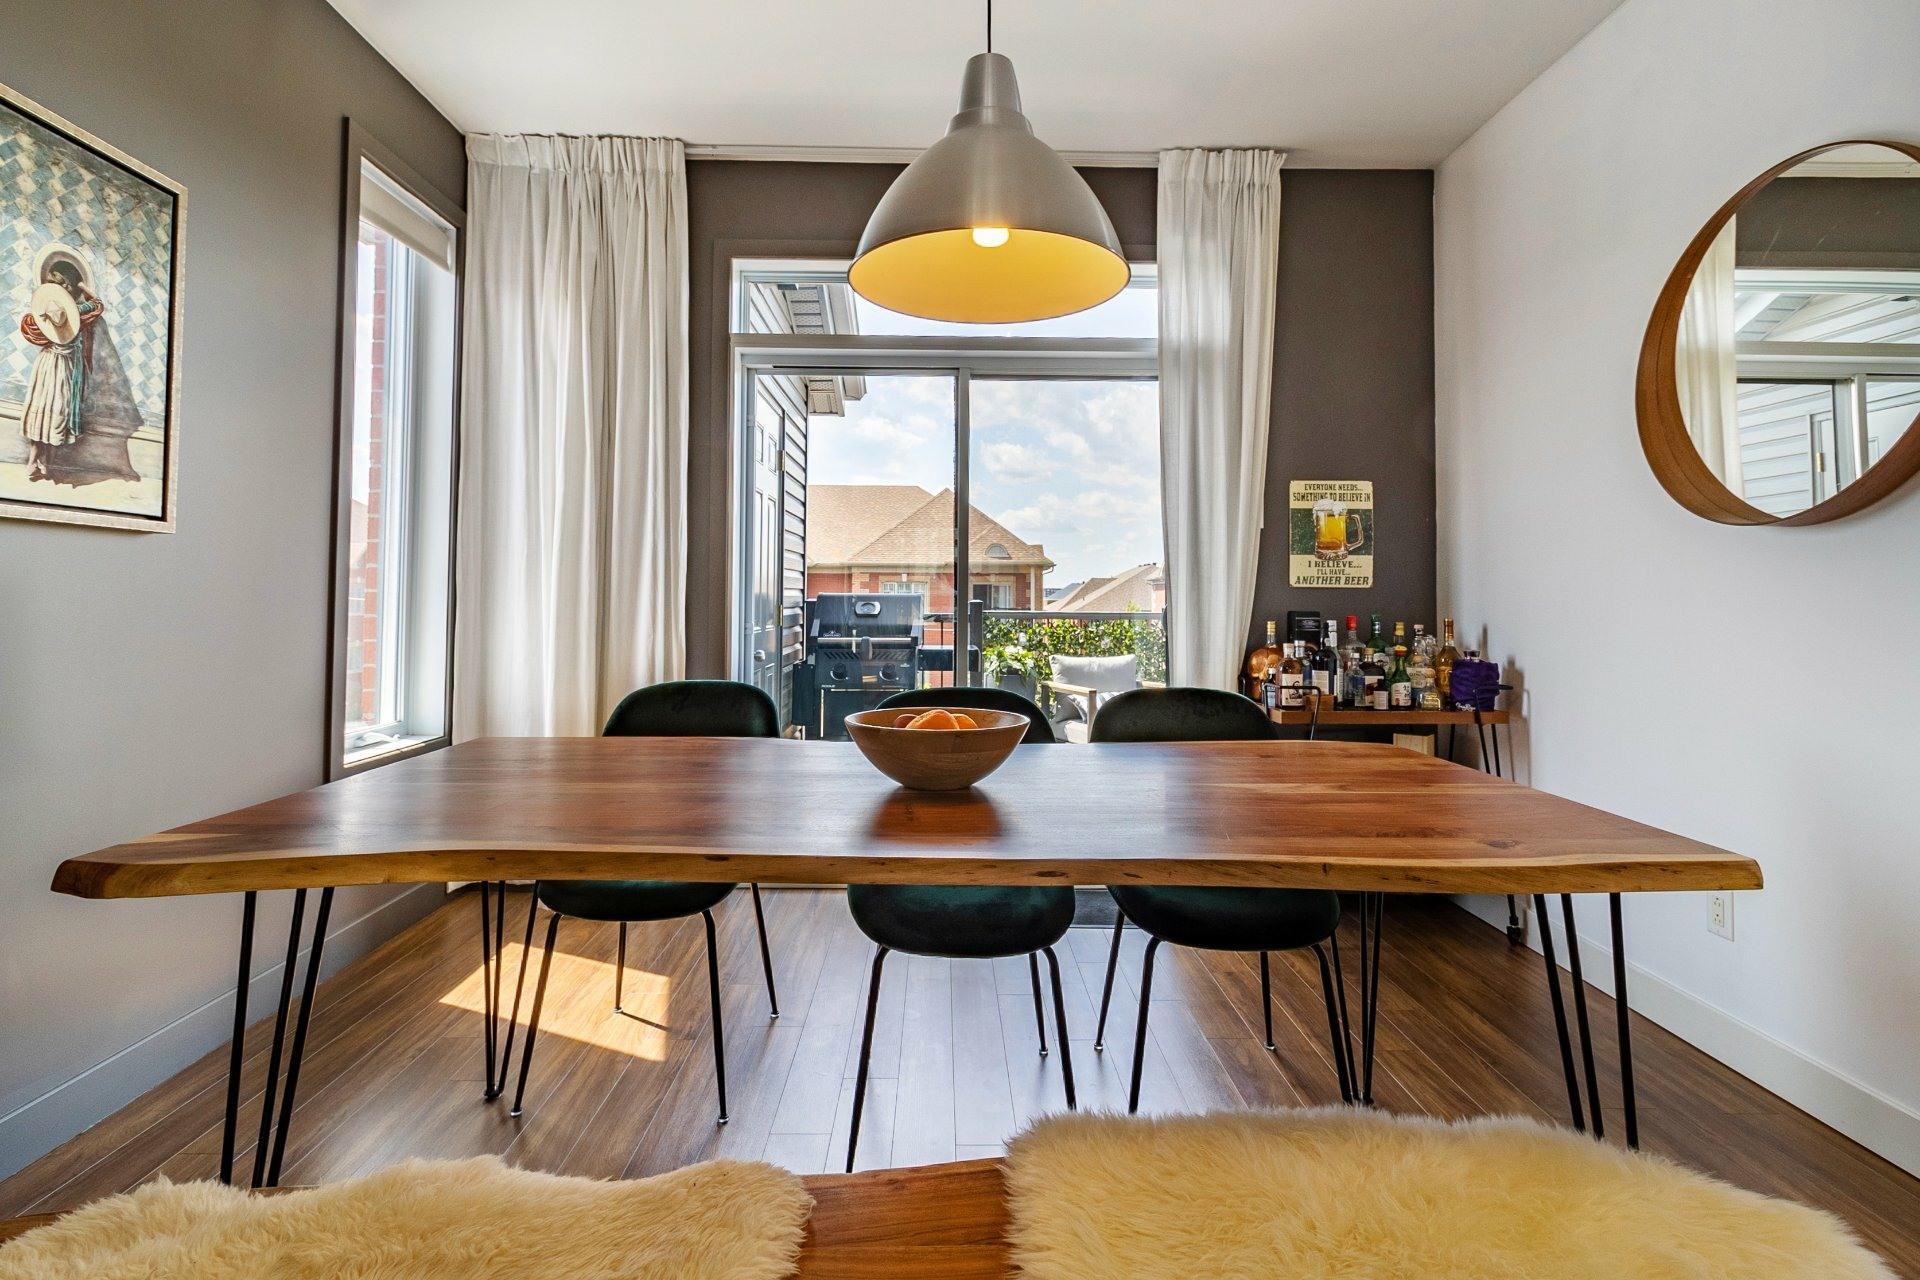 image 14 - Apartment For sale Saint-Hubert Longueuil  - 7 rooms